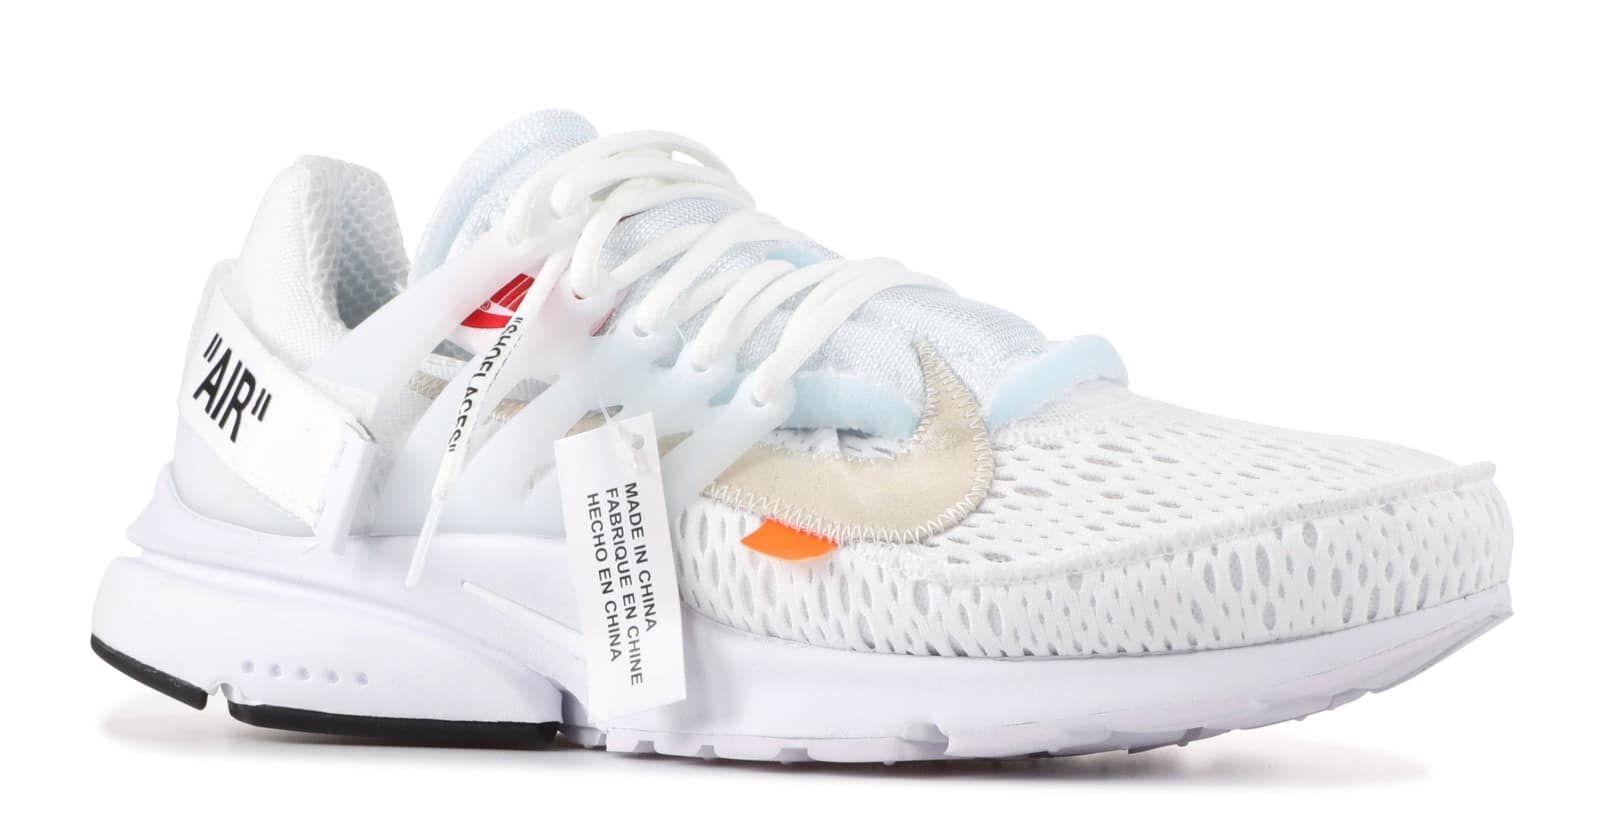 Off-White x Nike Air Presto 'White